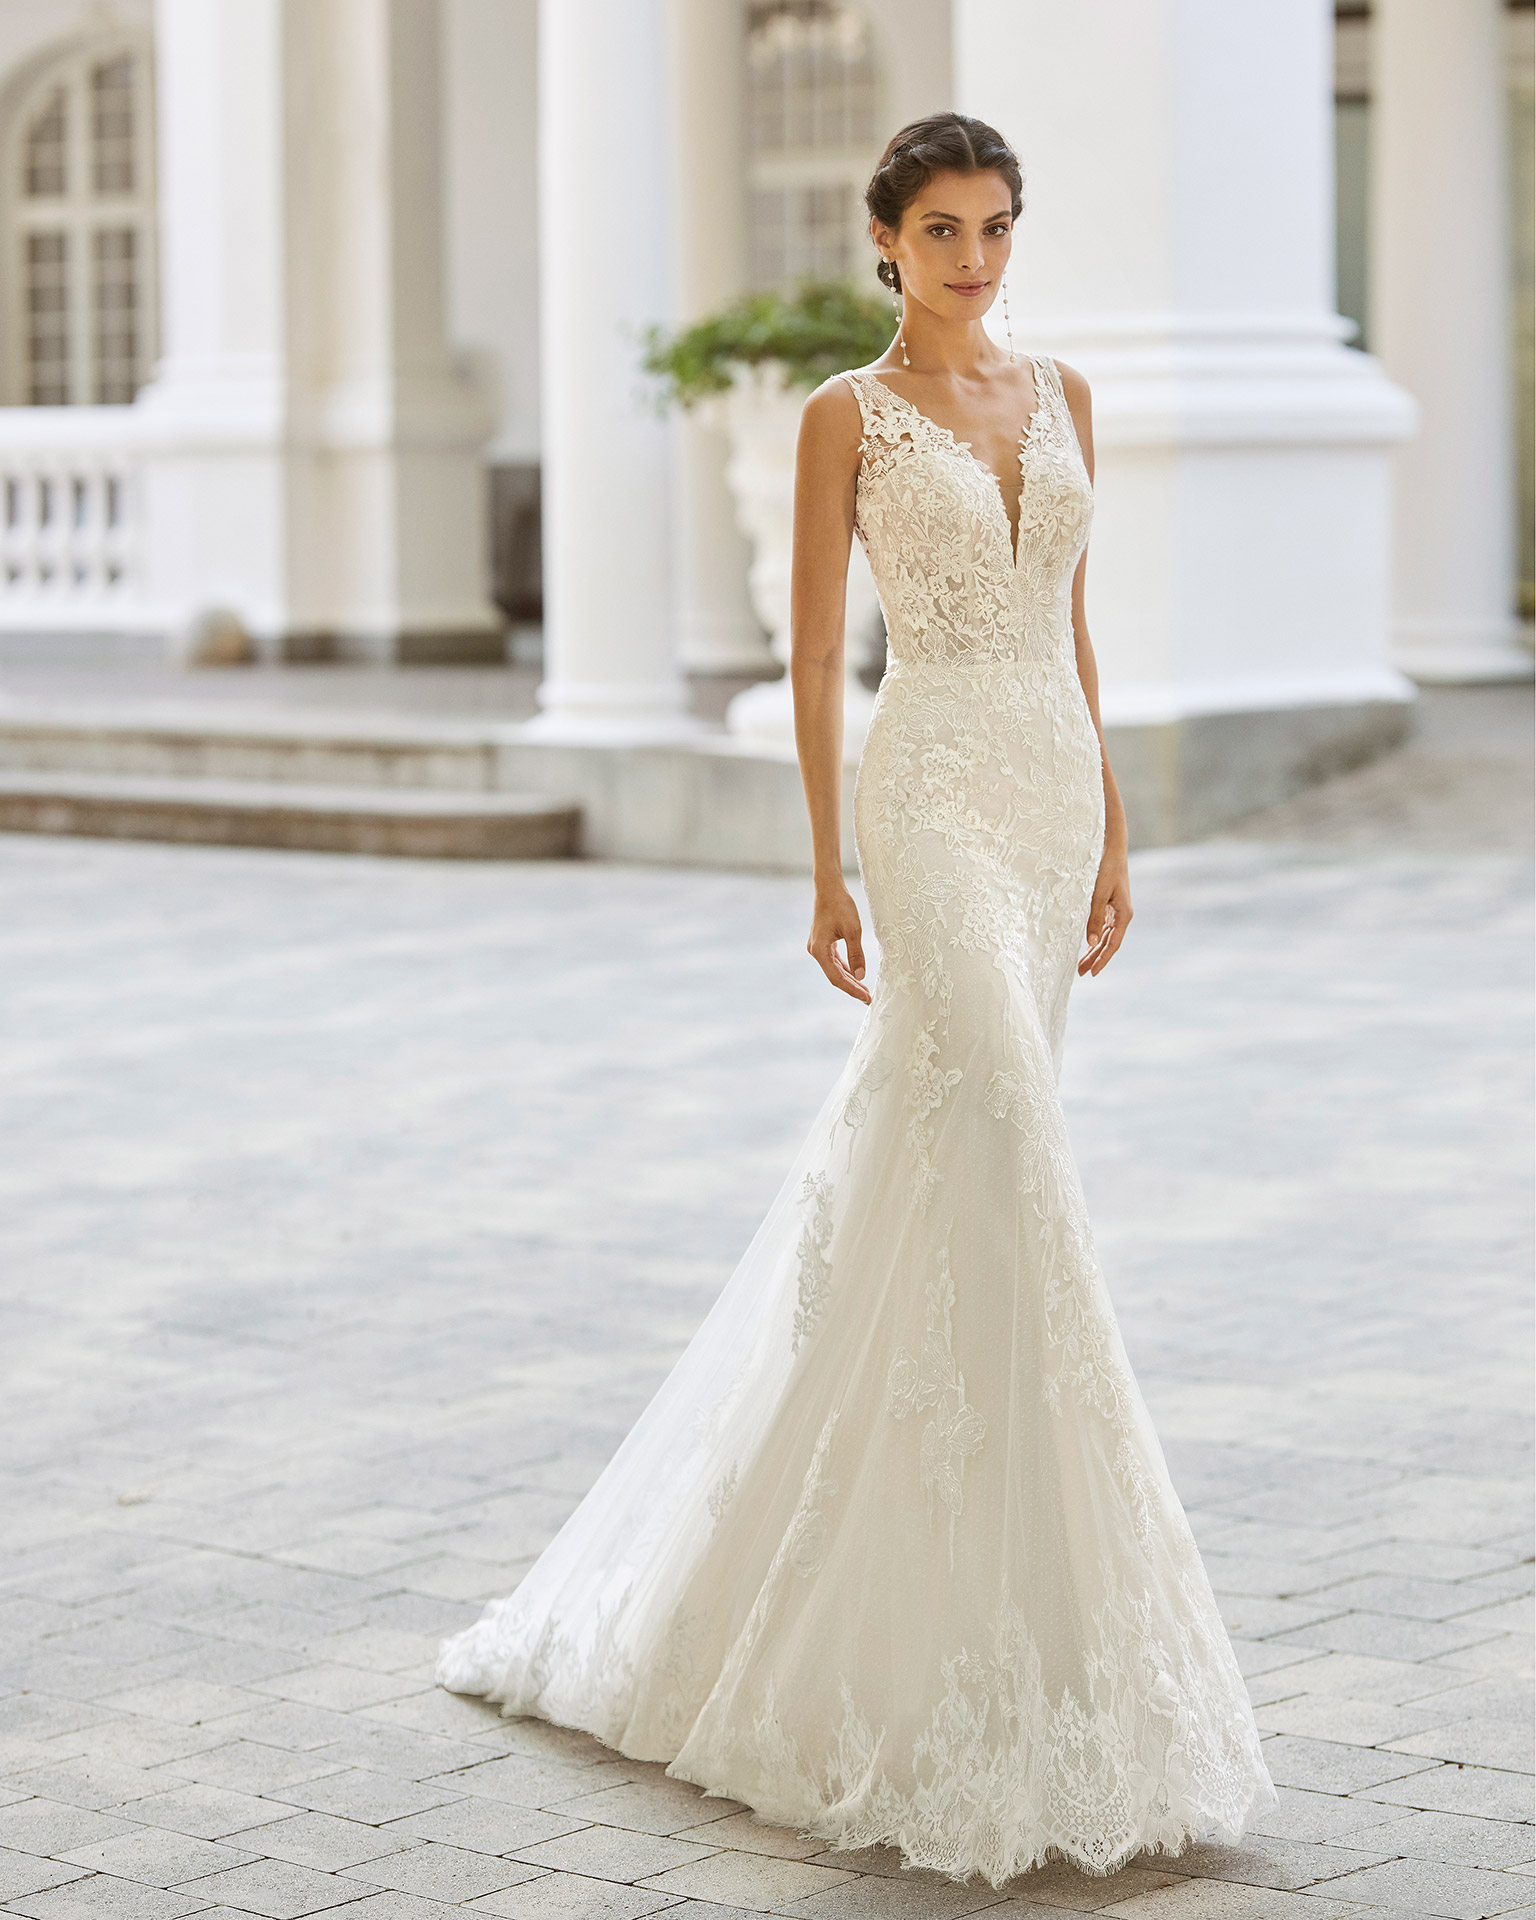 Adriana Alier modelo Sapporo colección 2022 rosa clará essencia novias